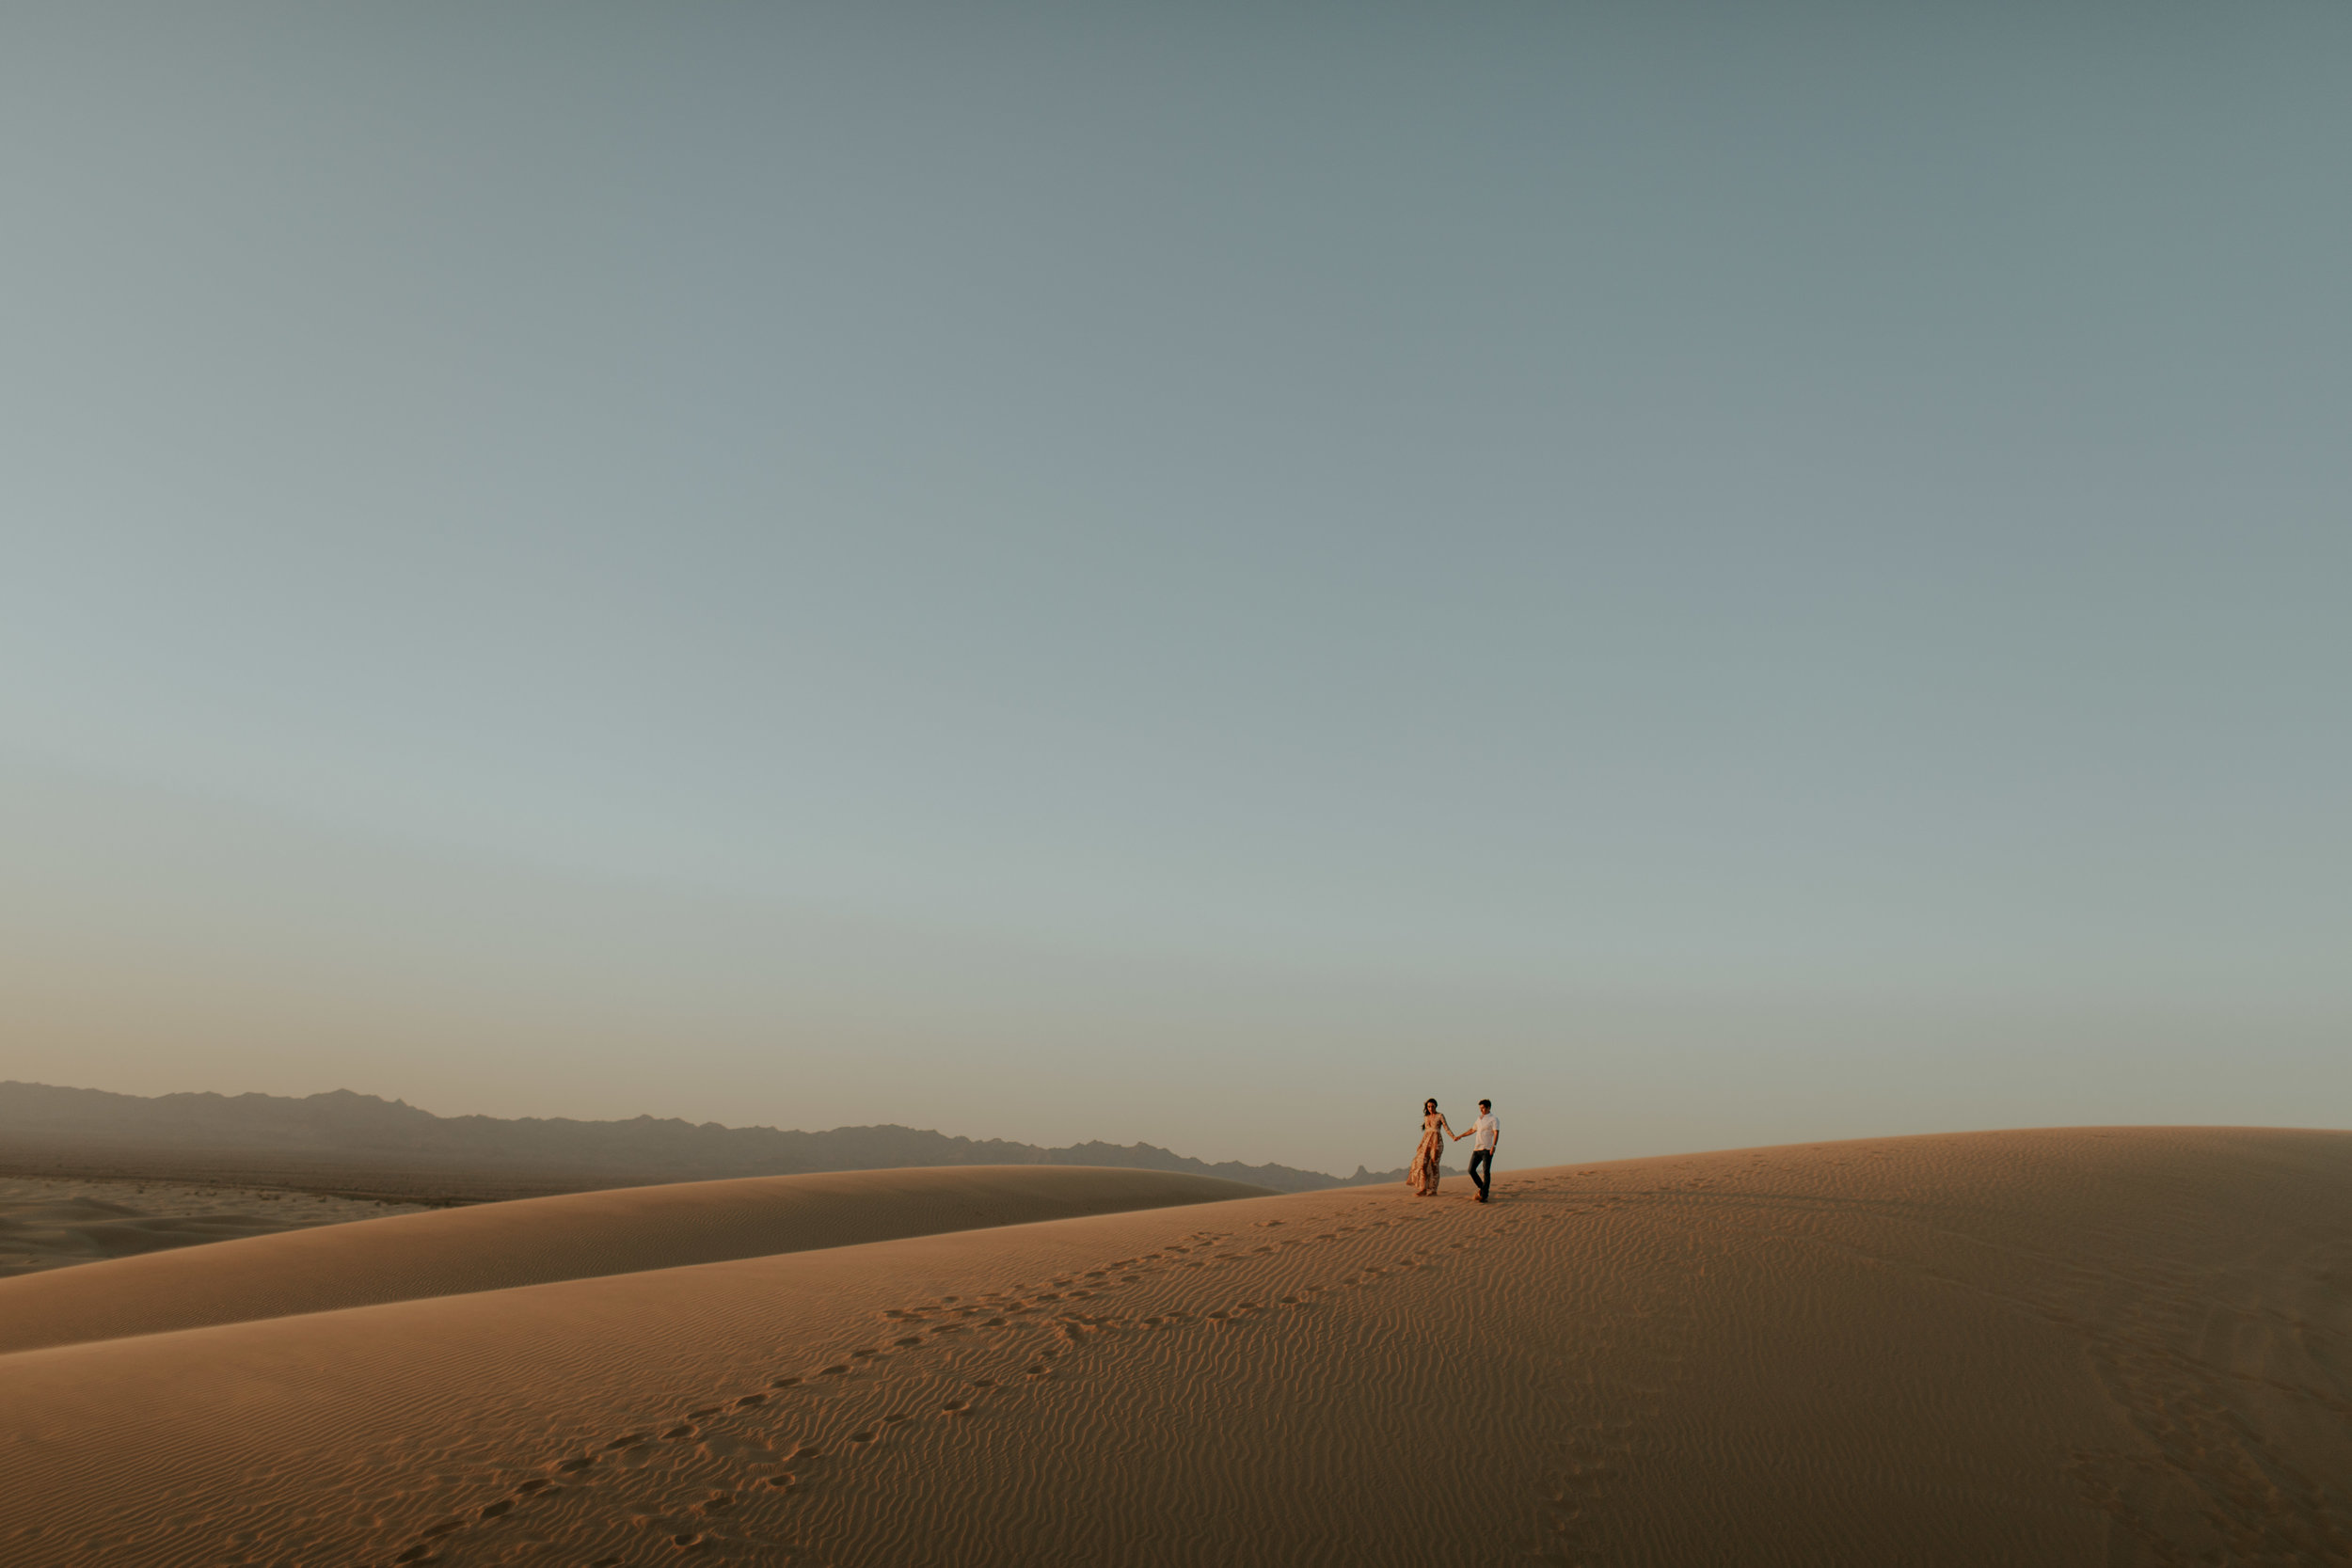 Imperial Sand Dunes Engagement - Alyssa + Matt - Trin Jensen Photography-73.JPG